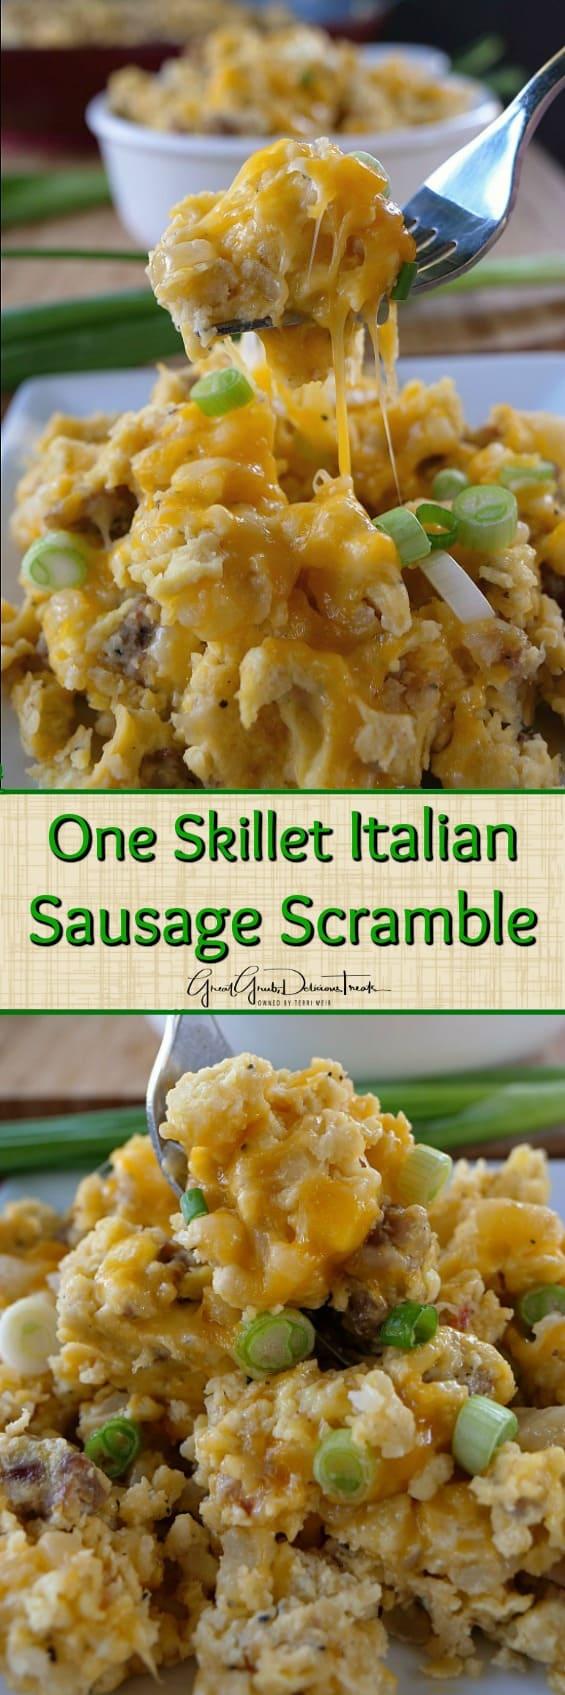 One Skillet Italian Sausage Scramble